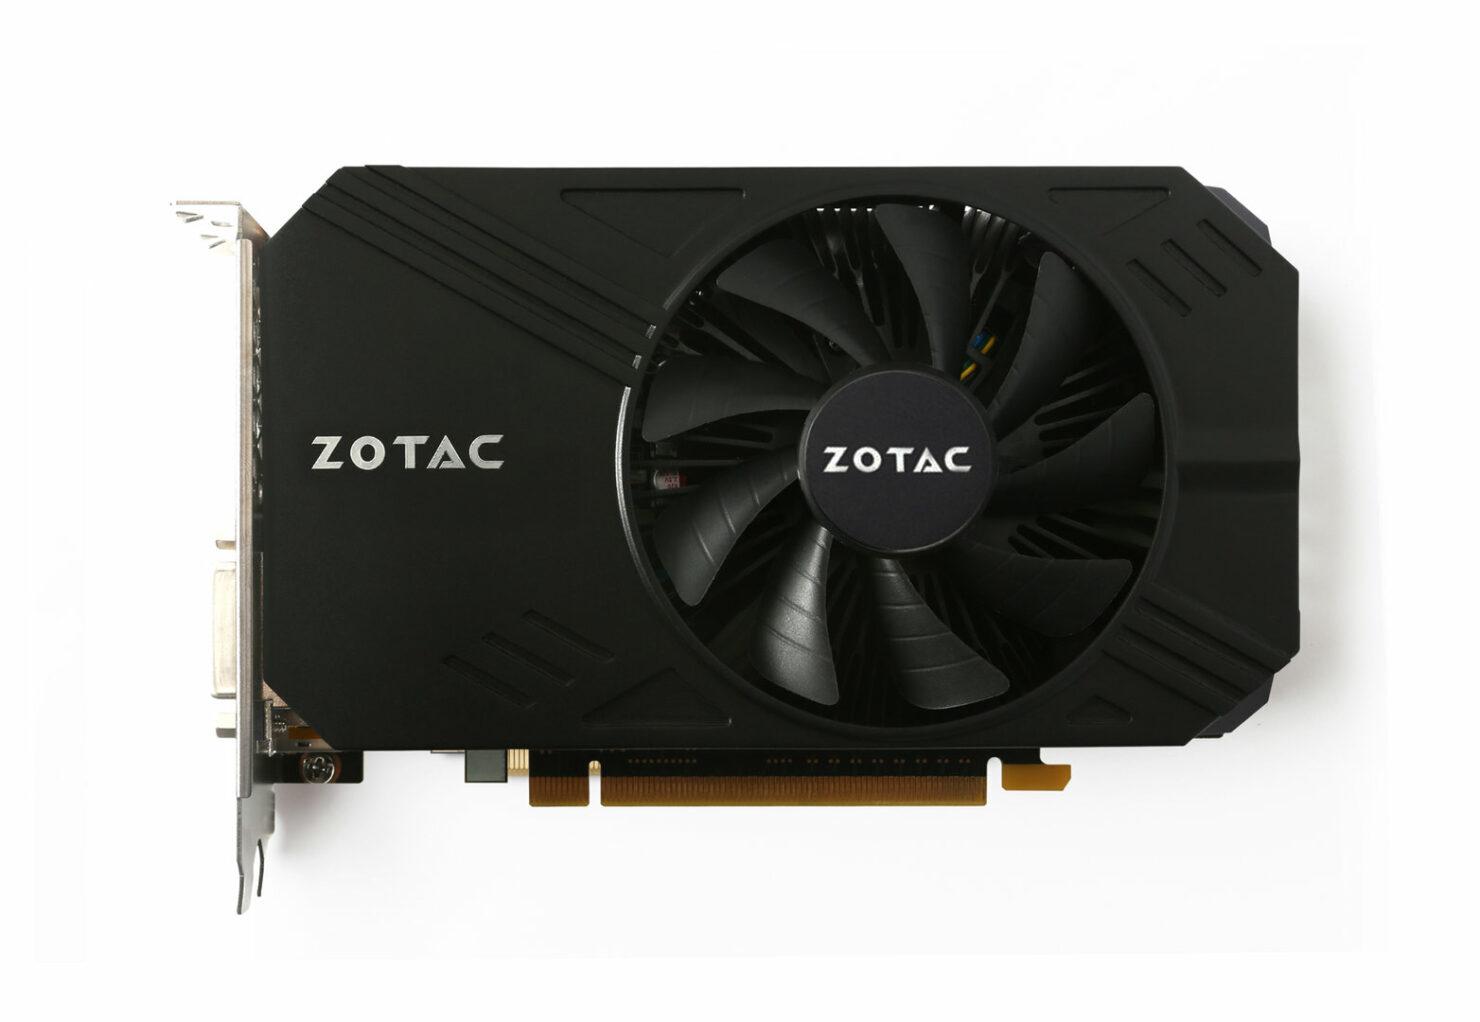 zotac-geforce-gtx-960-itx-compact_top